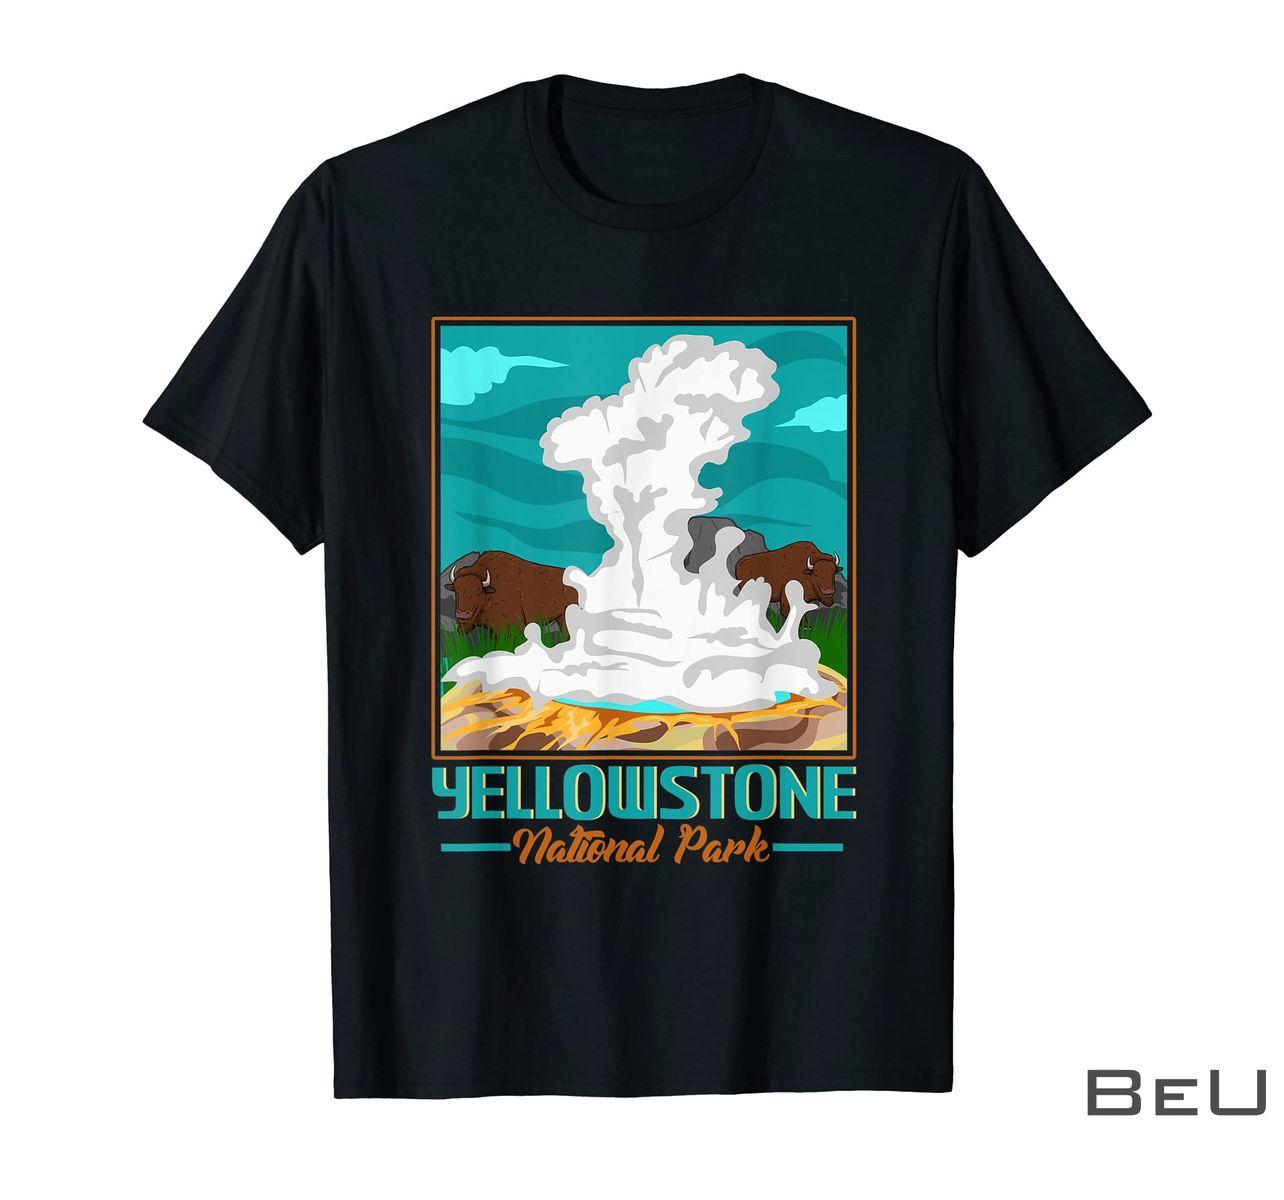 Retro National Park Shirt Vintage Yellowstone National Shirt